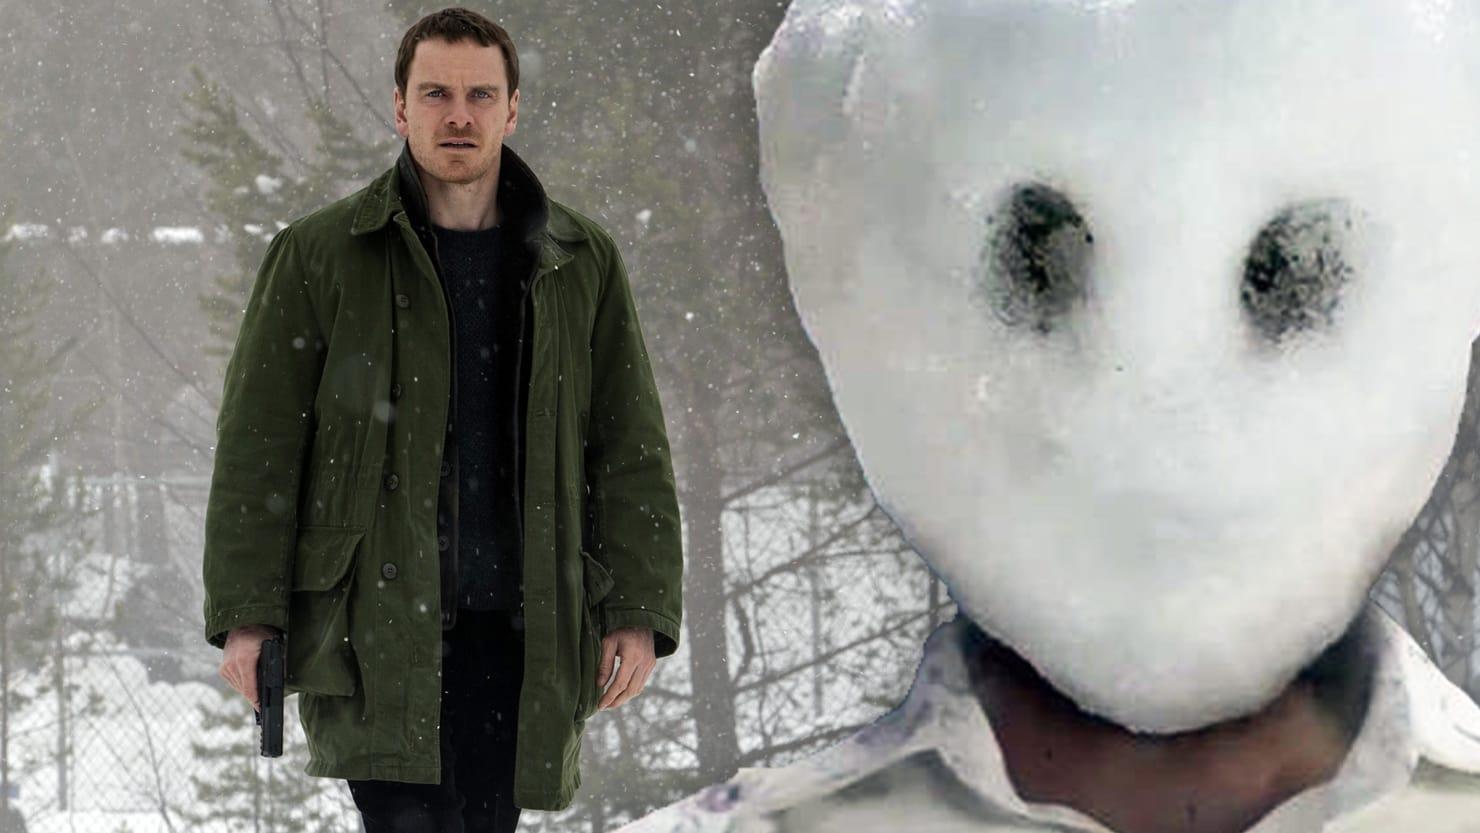 The Snowman แฮร์รี่ โฮล กับคดีฆาตกรมนุษย์หิมะ